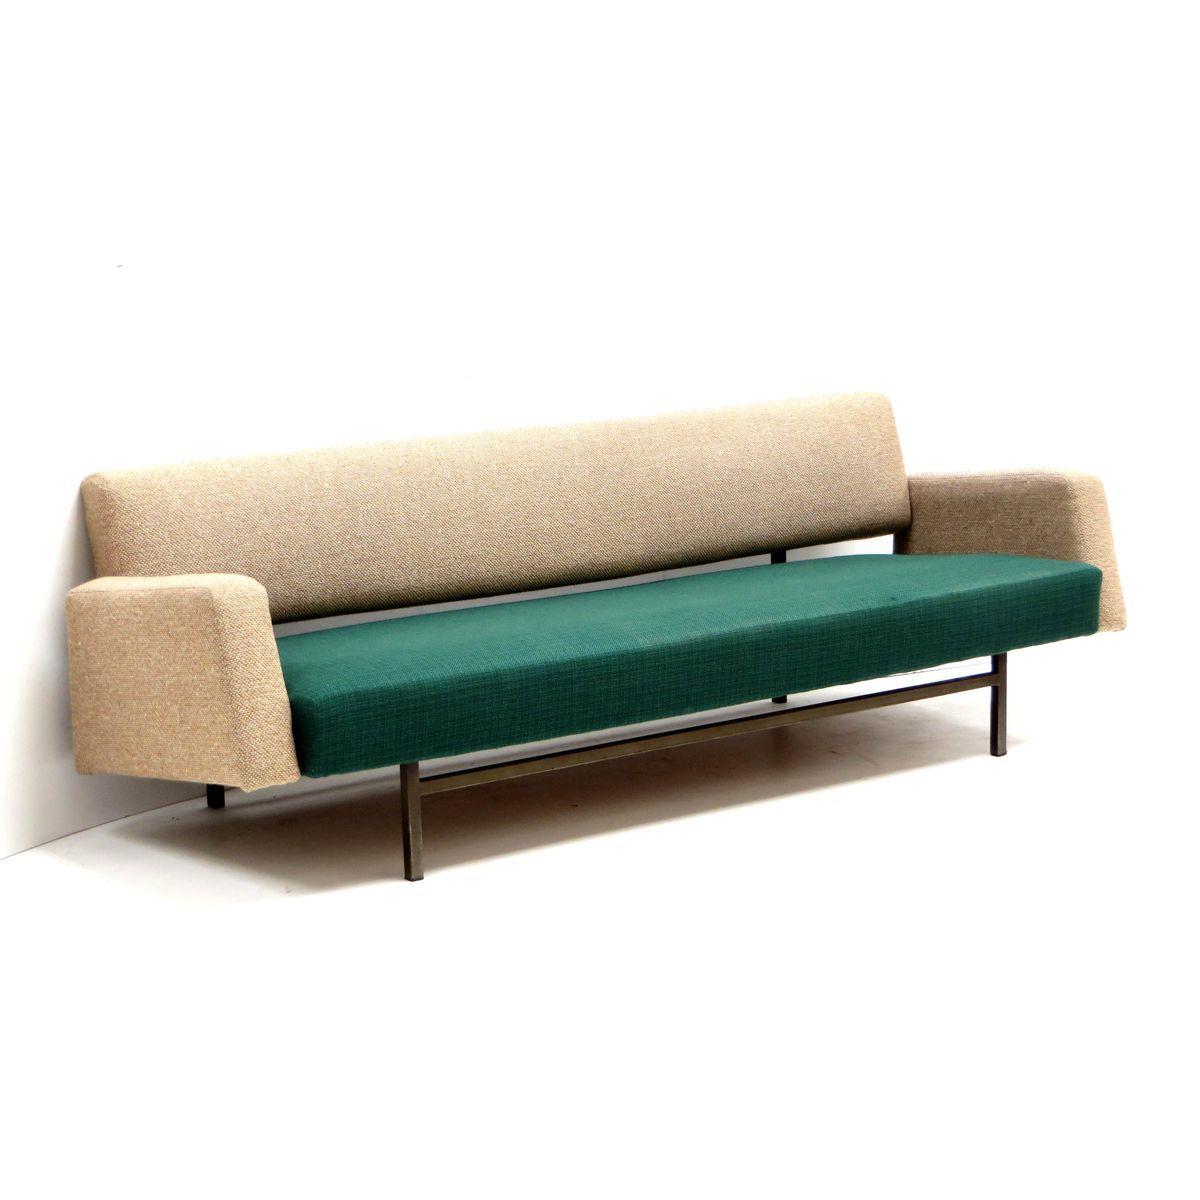 Mid Century Modern Sofa Mid Century Sofa Vintage Sofa Retro